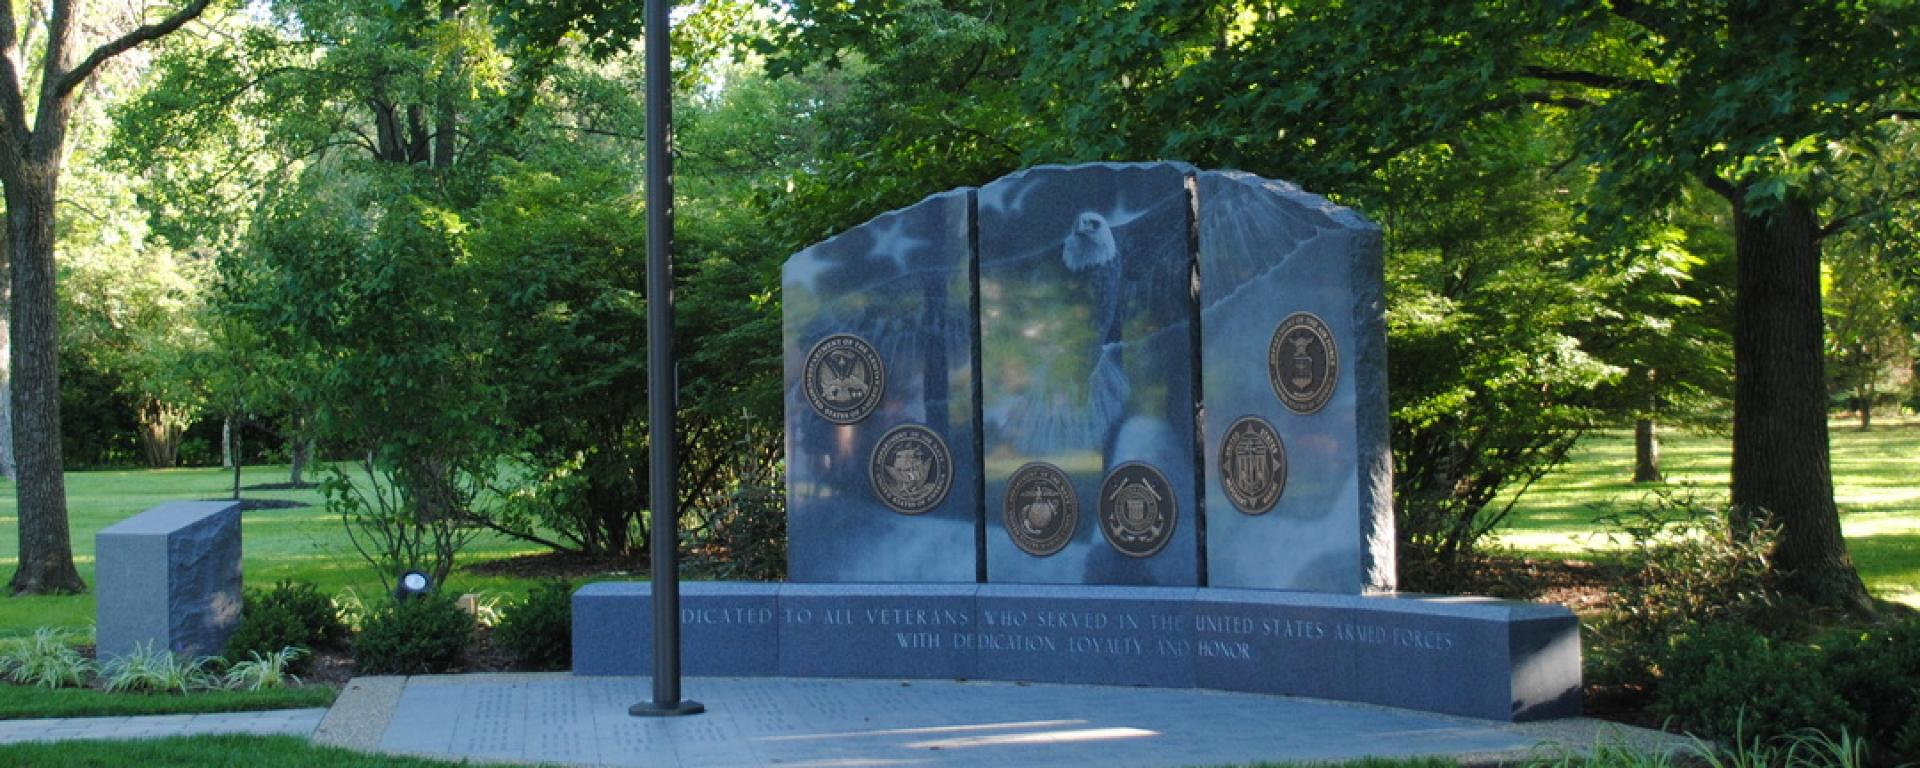 Front view of Indian Hill Veteran's Memorial